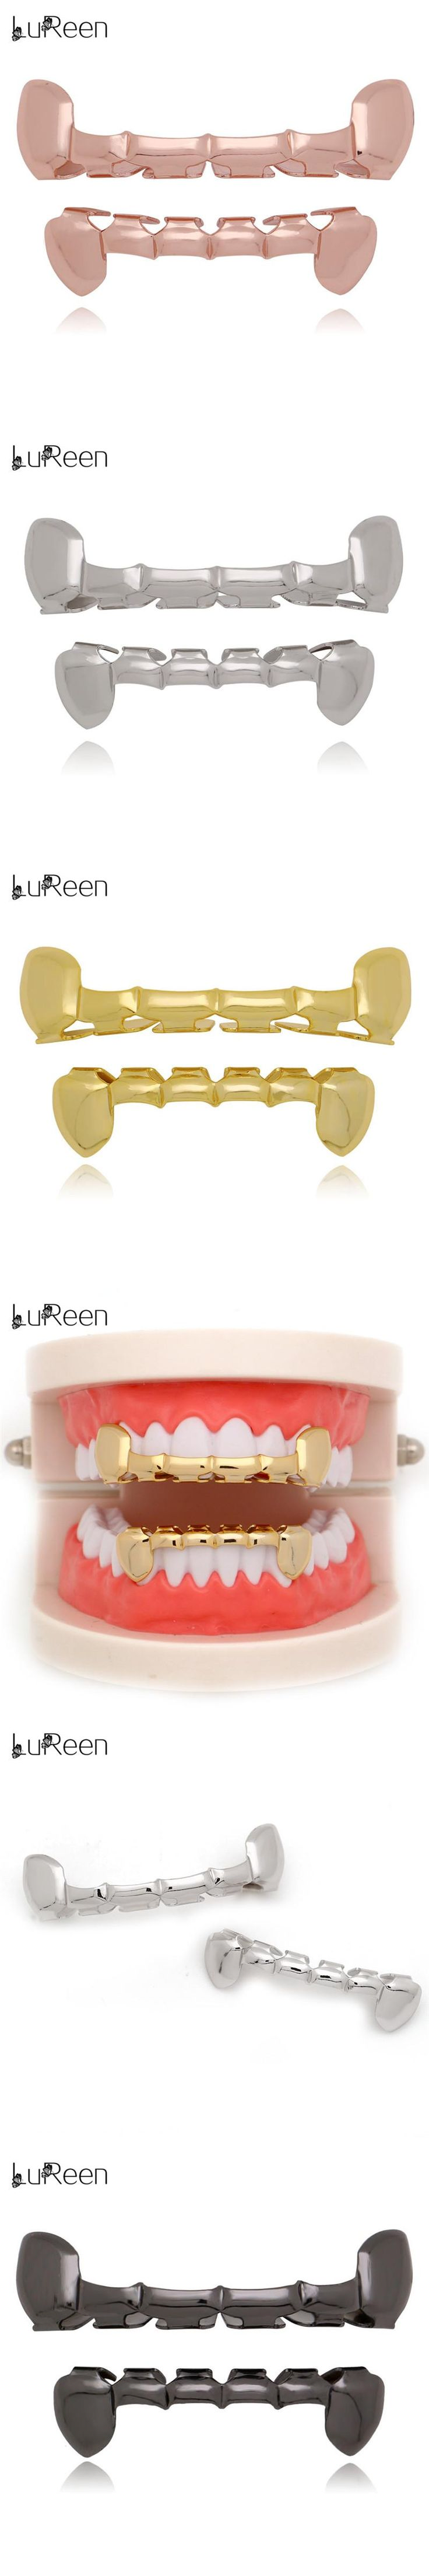 LuReen Hip Hop Gold Teeth Grills Dental Top & Bottom Half Teeth Grills Halloween Vampire Fang Tooth Caps Jewelry Party LD0019